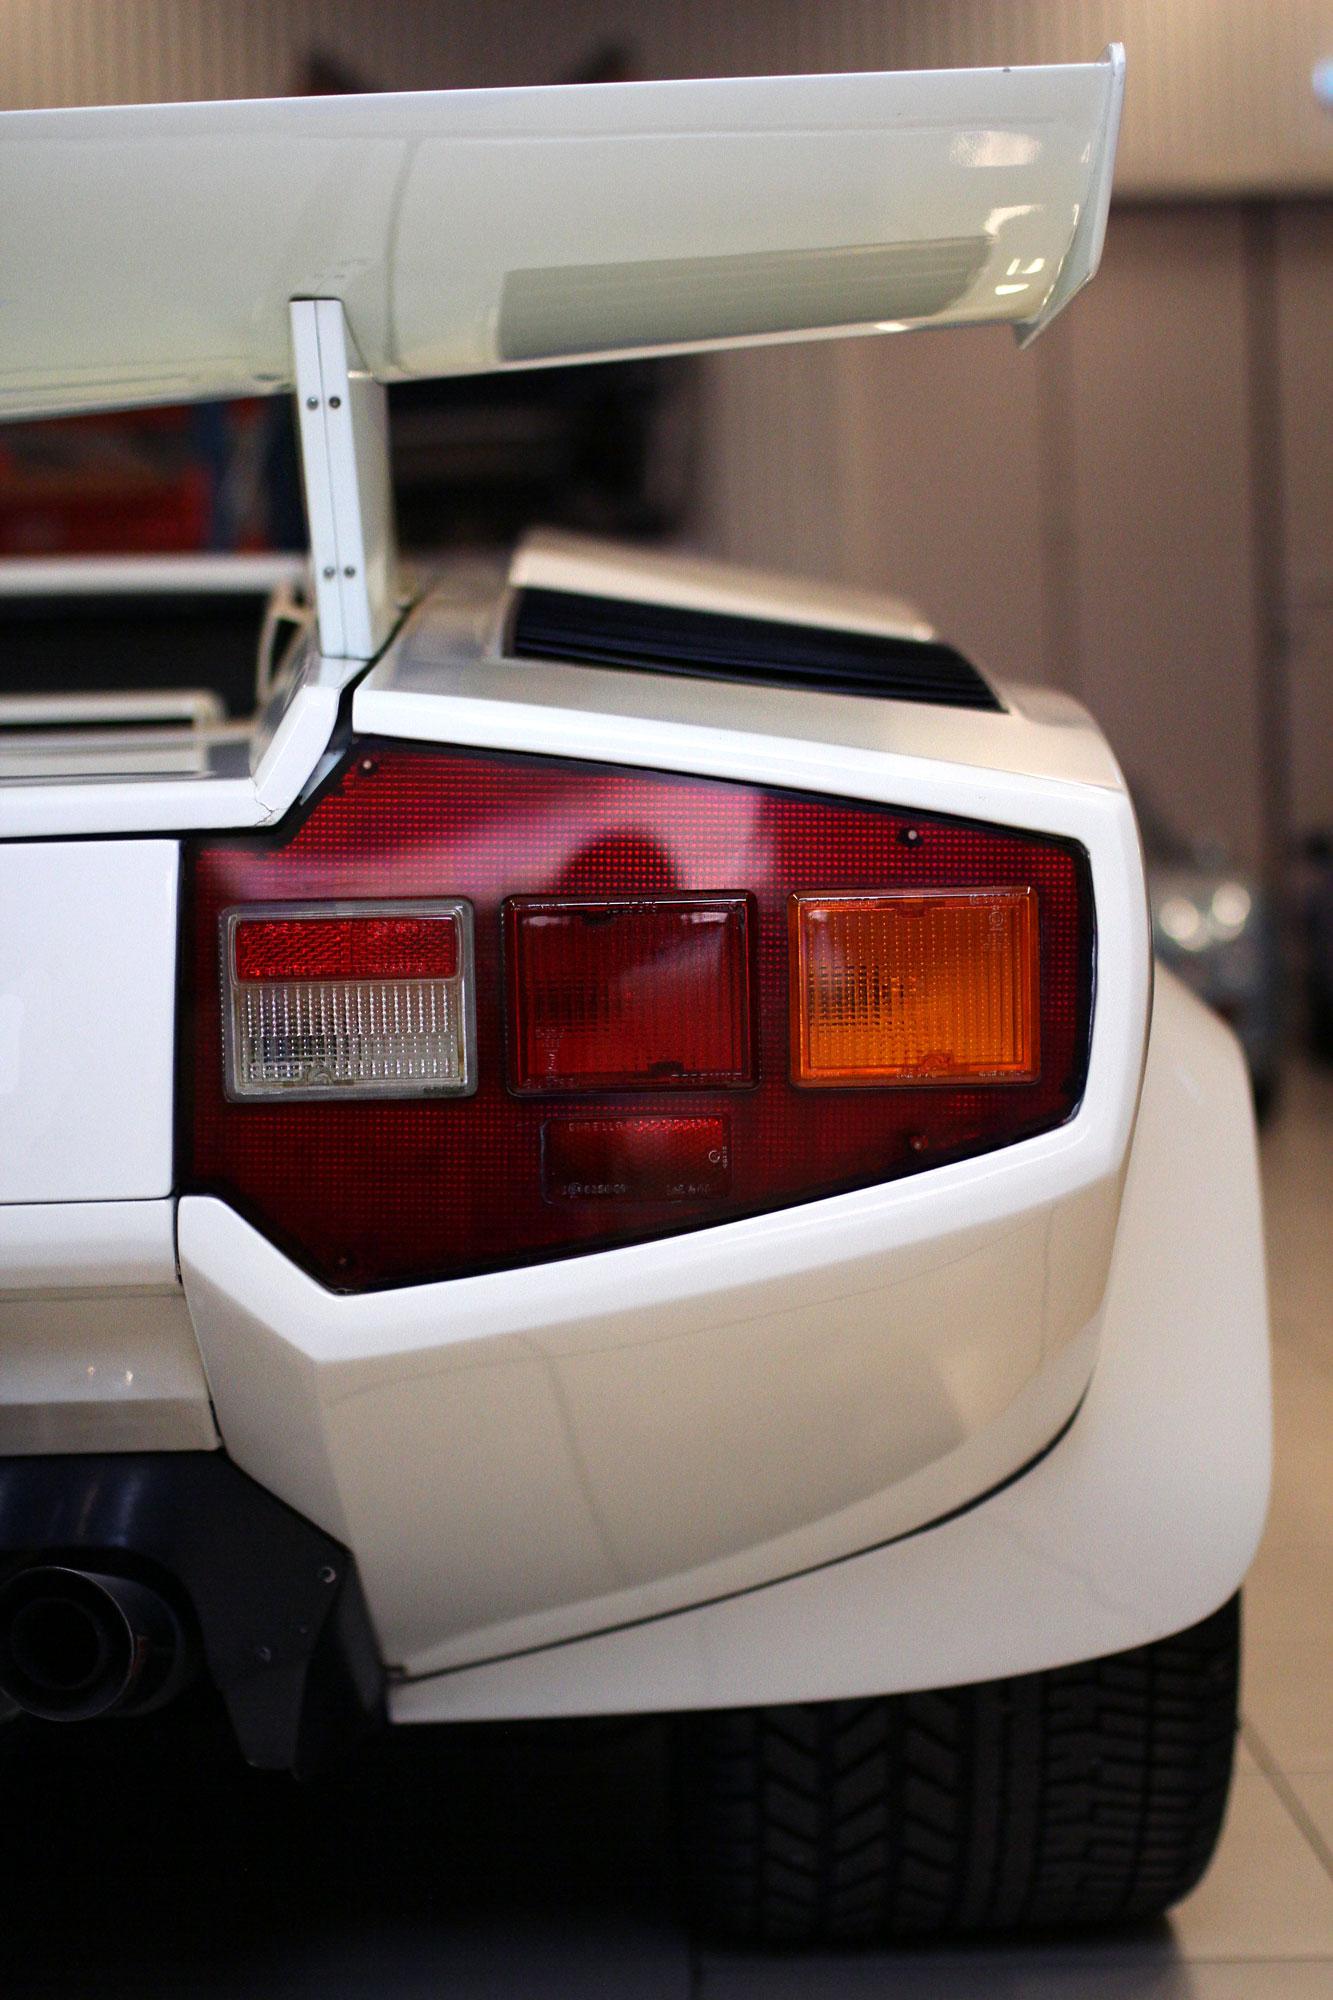 Lamborghini Countach vit höger bakljus med stor grym vinge